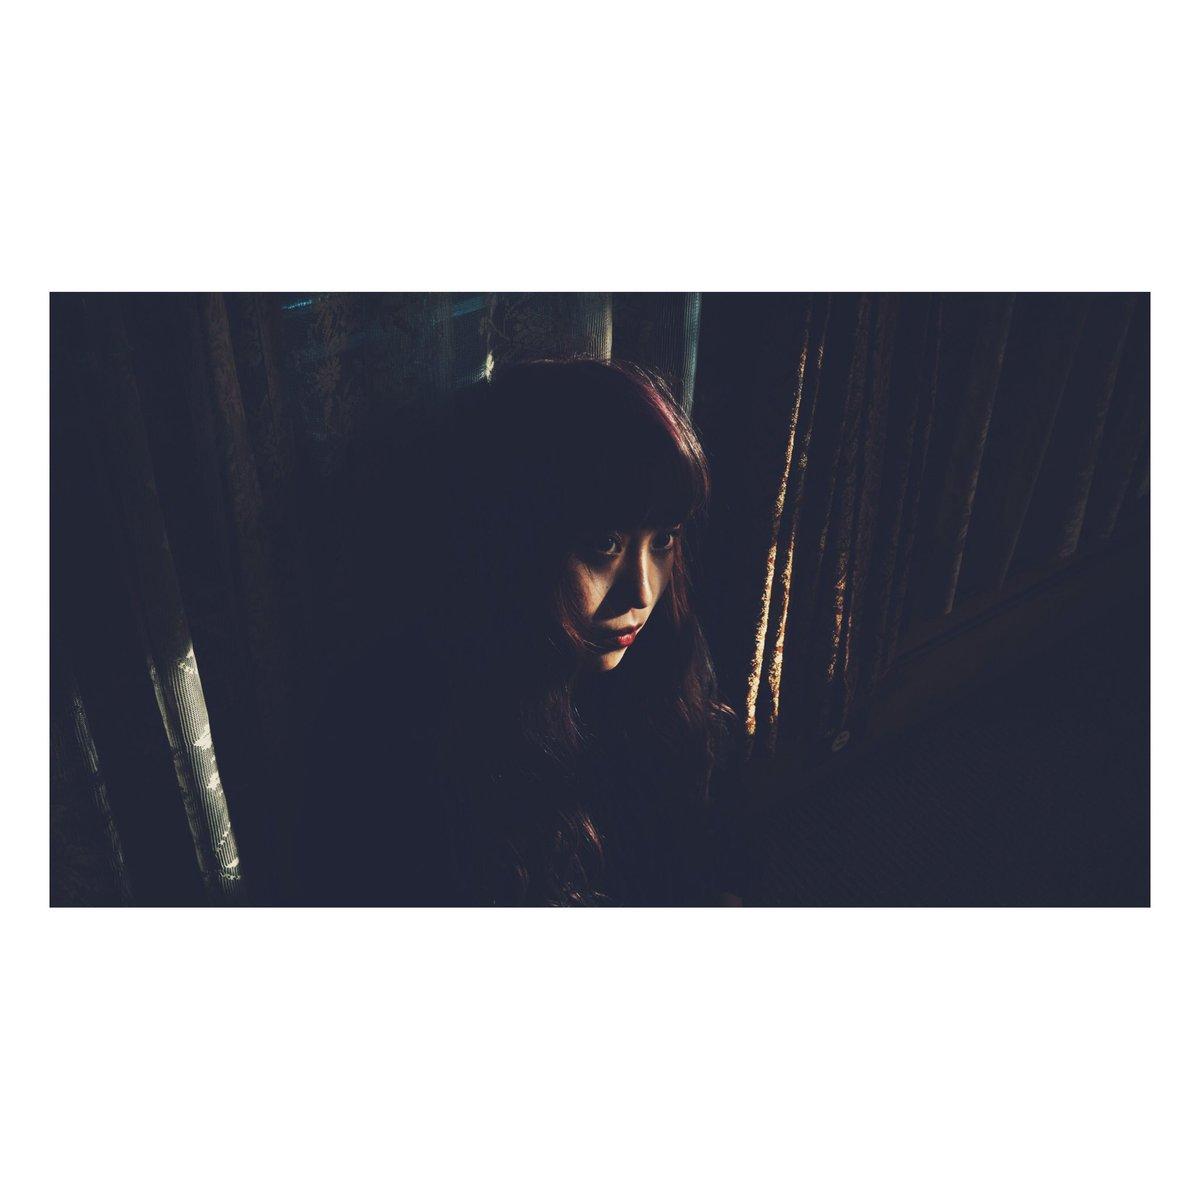 09 #photography #rx100m6 #instagram #vsco